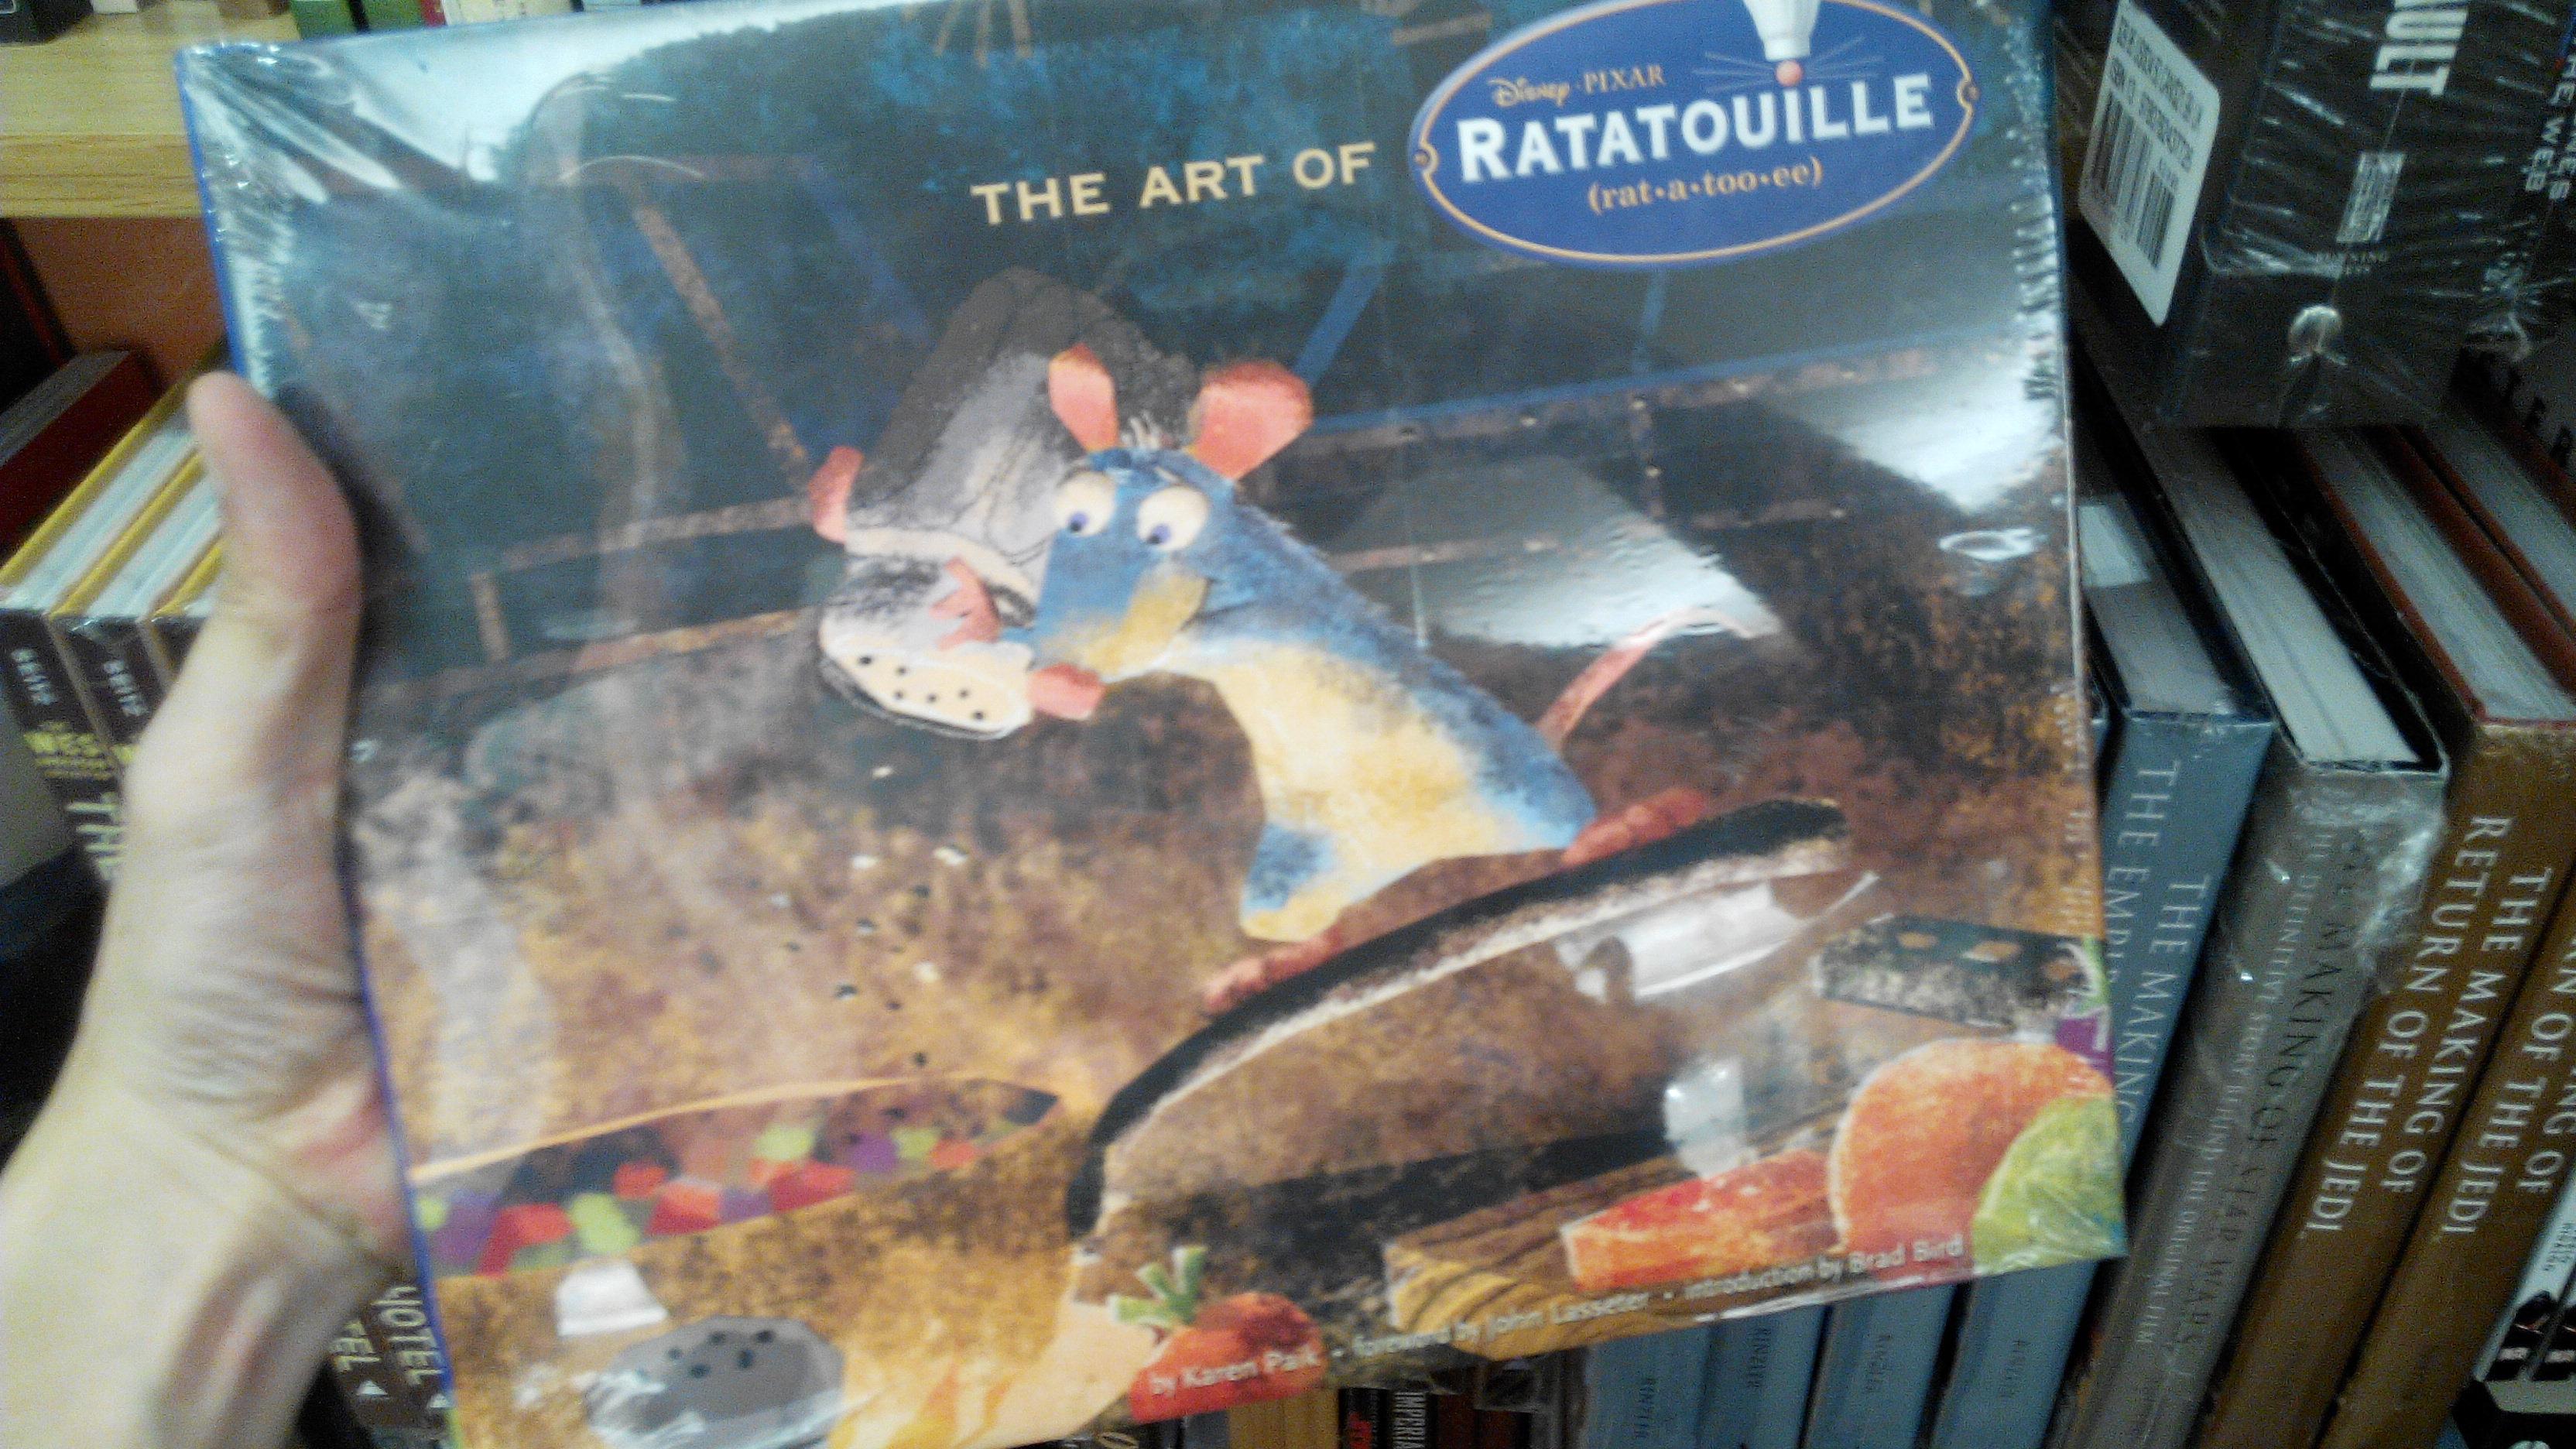 The art of Ratatouille.jpg